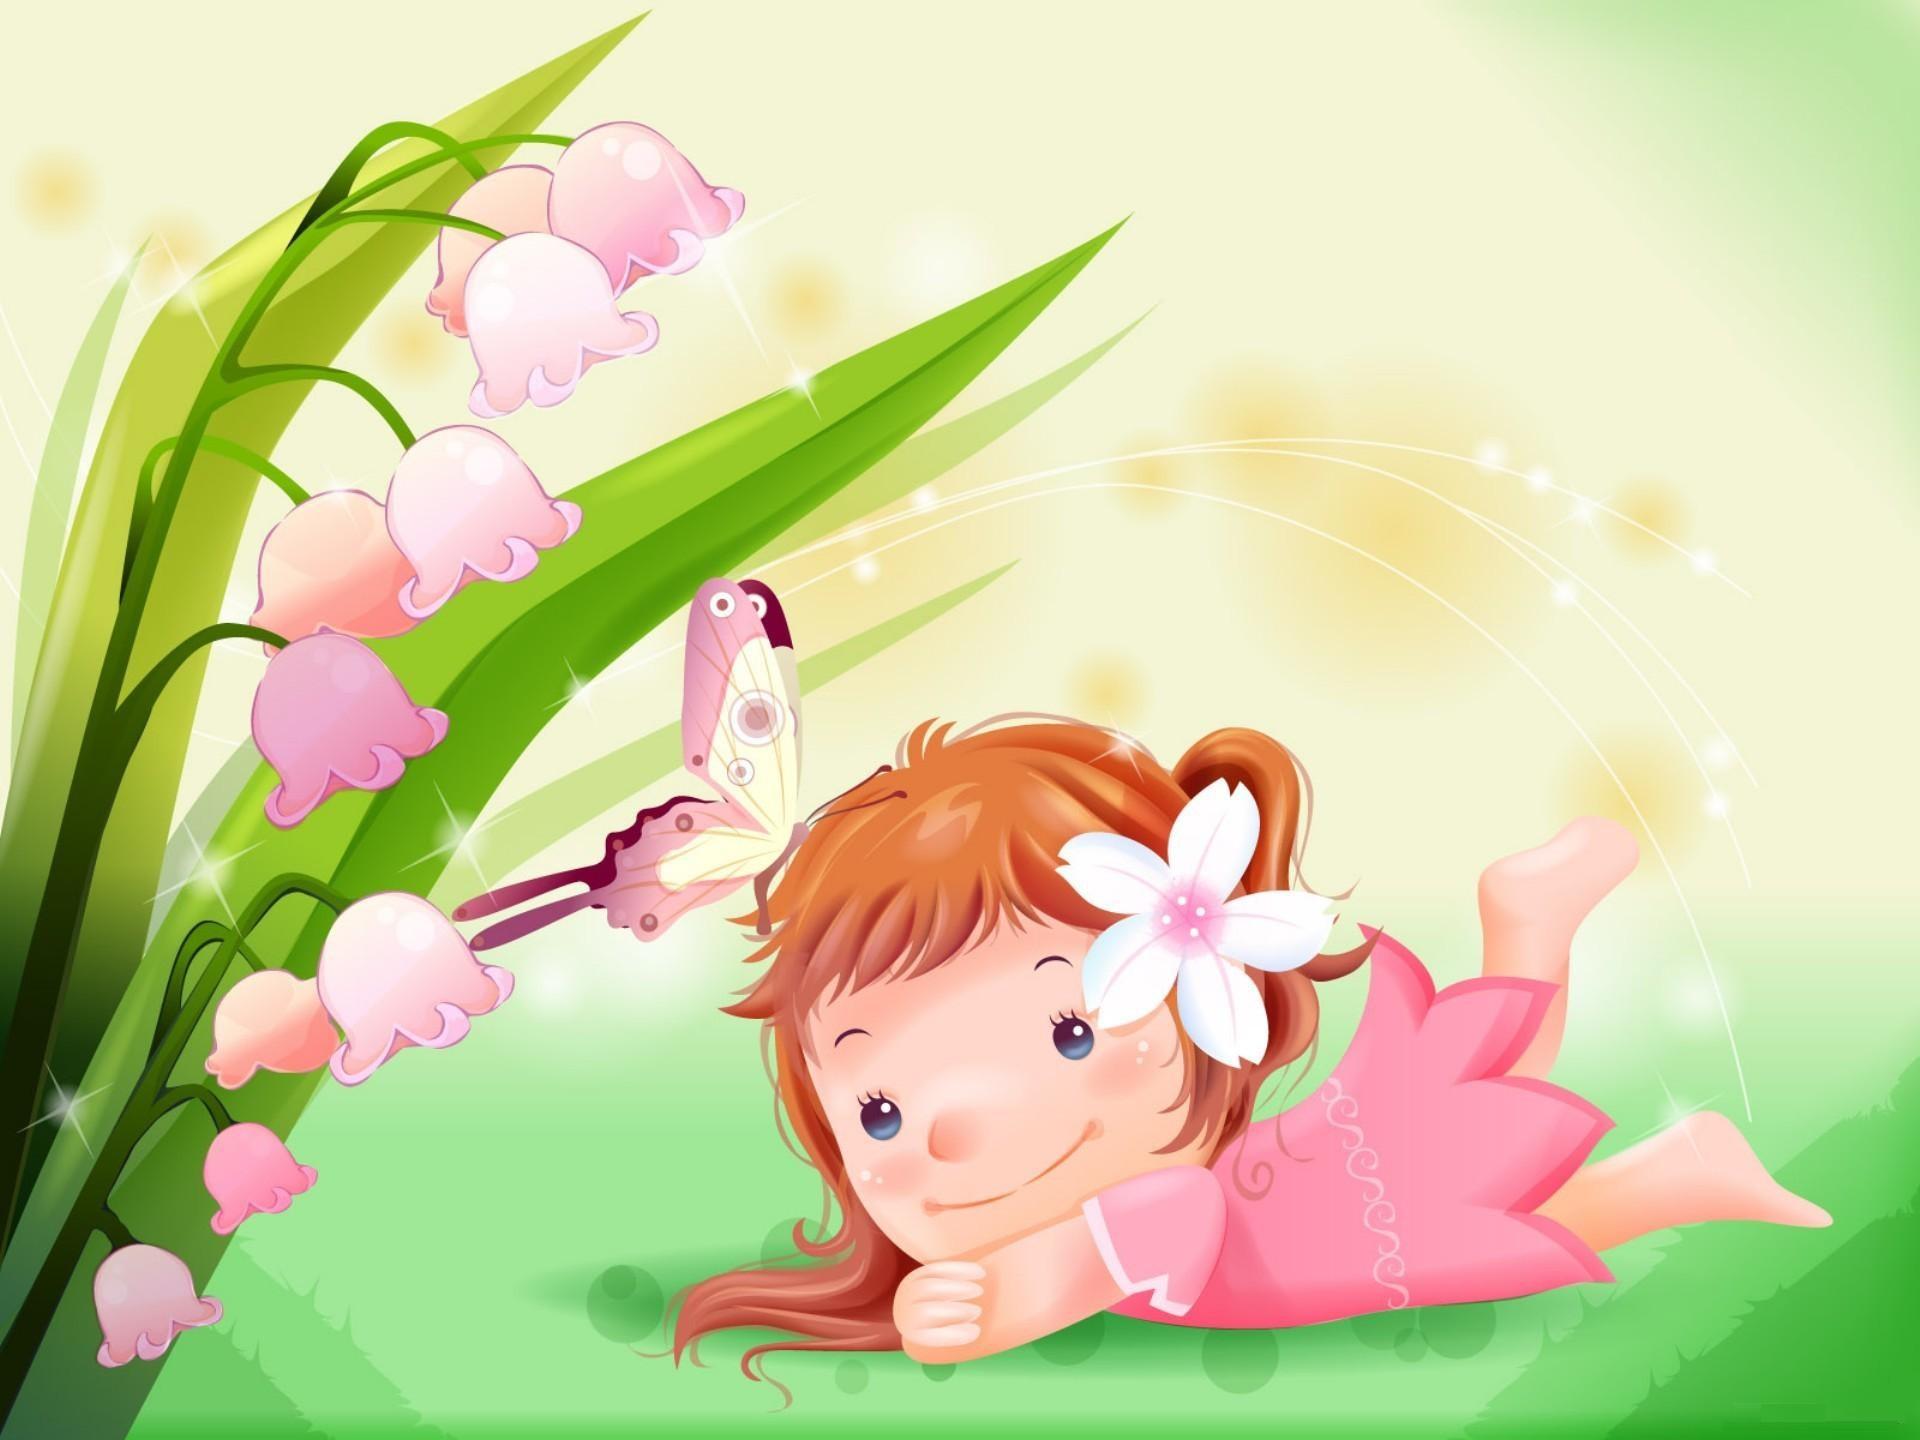 Cute Cartoon Girl with Flower HD Wallpaper Desktop Backgrounds Free